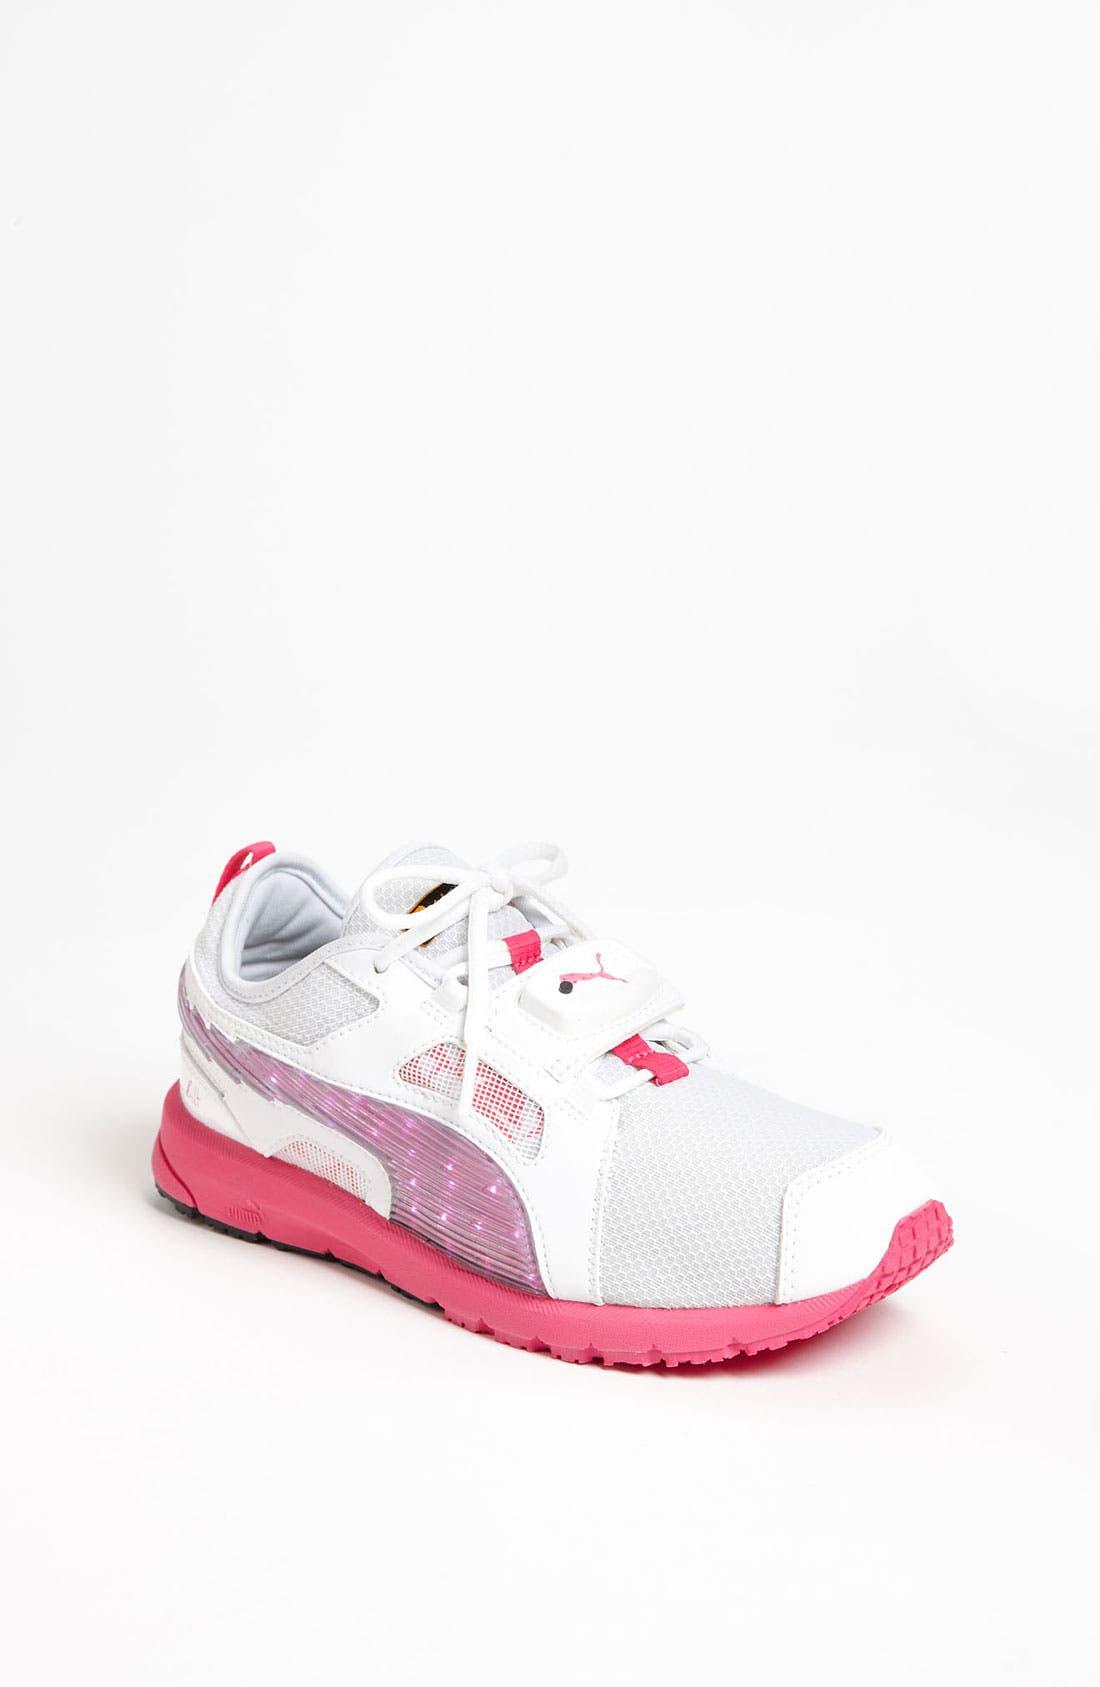 Alternate Image 1 Selected - PUMA 'Bolt evoSPEEDOMETER Jr.' Sneaker (Toddler, Little Kid & Big Kid)